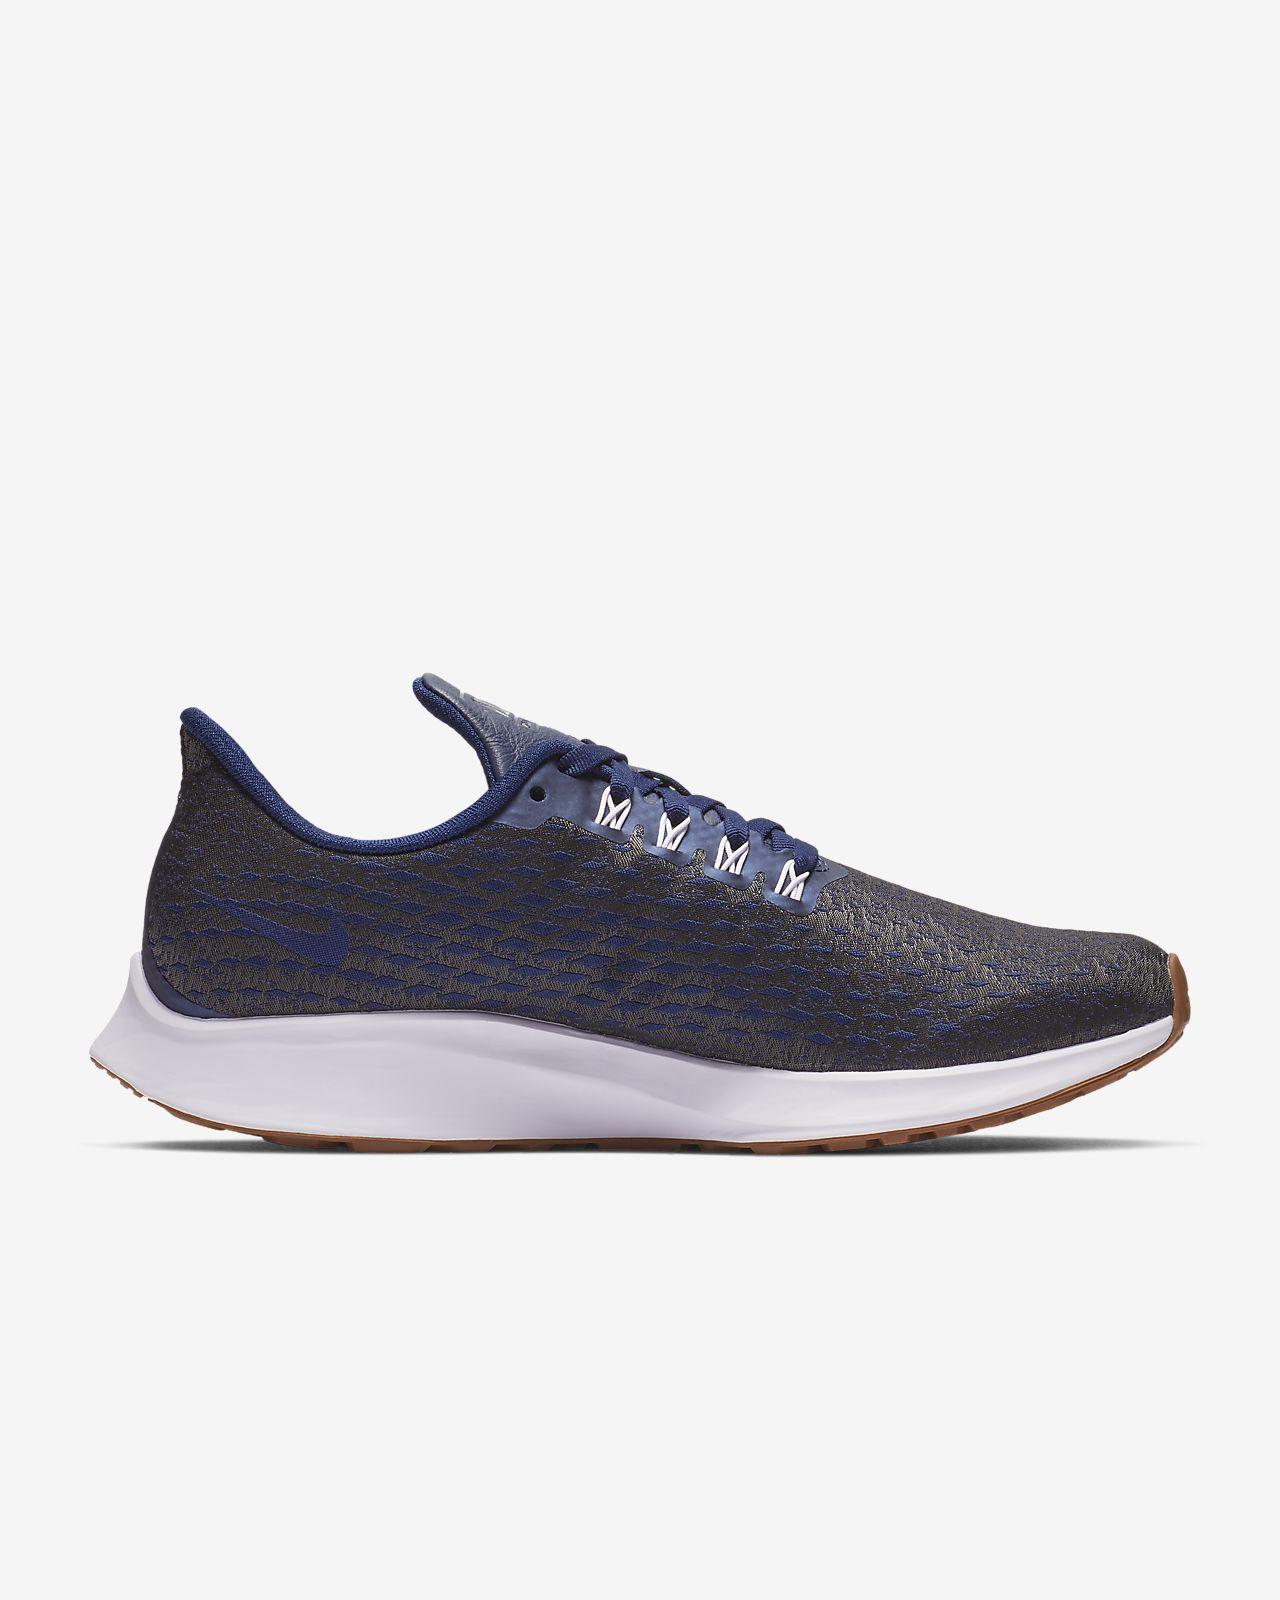 7e7d3a2ff6915c Nike Air Zoom Pegasus 35 Premium Women s Running Shoe. Nike.com